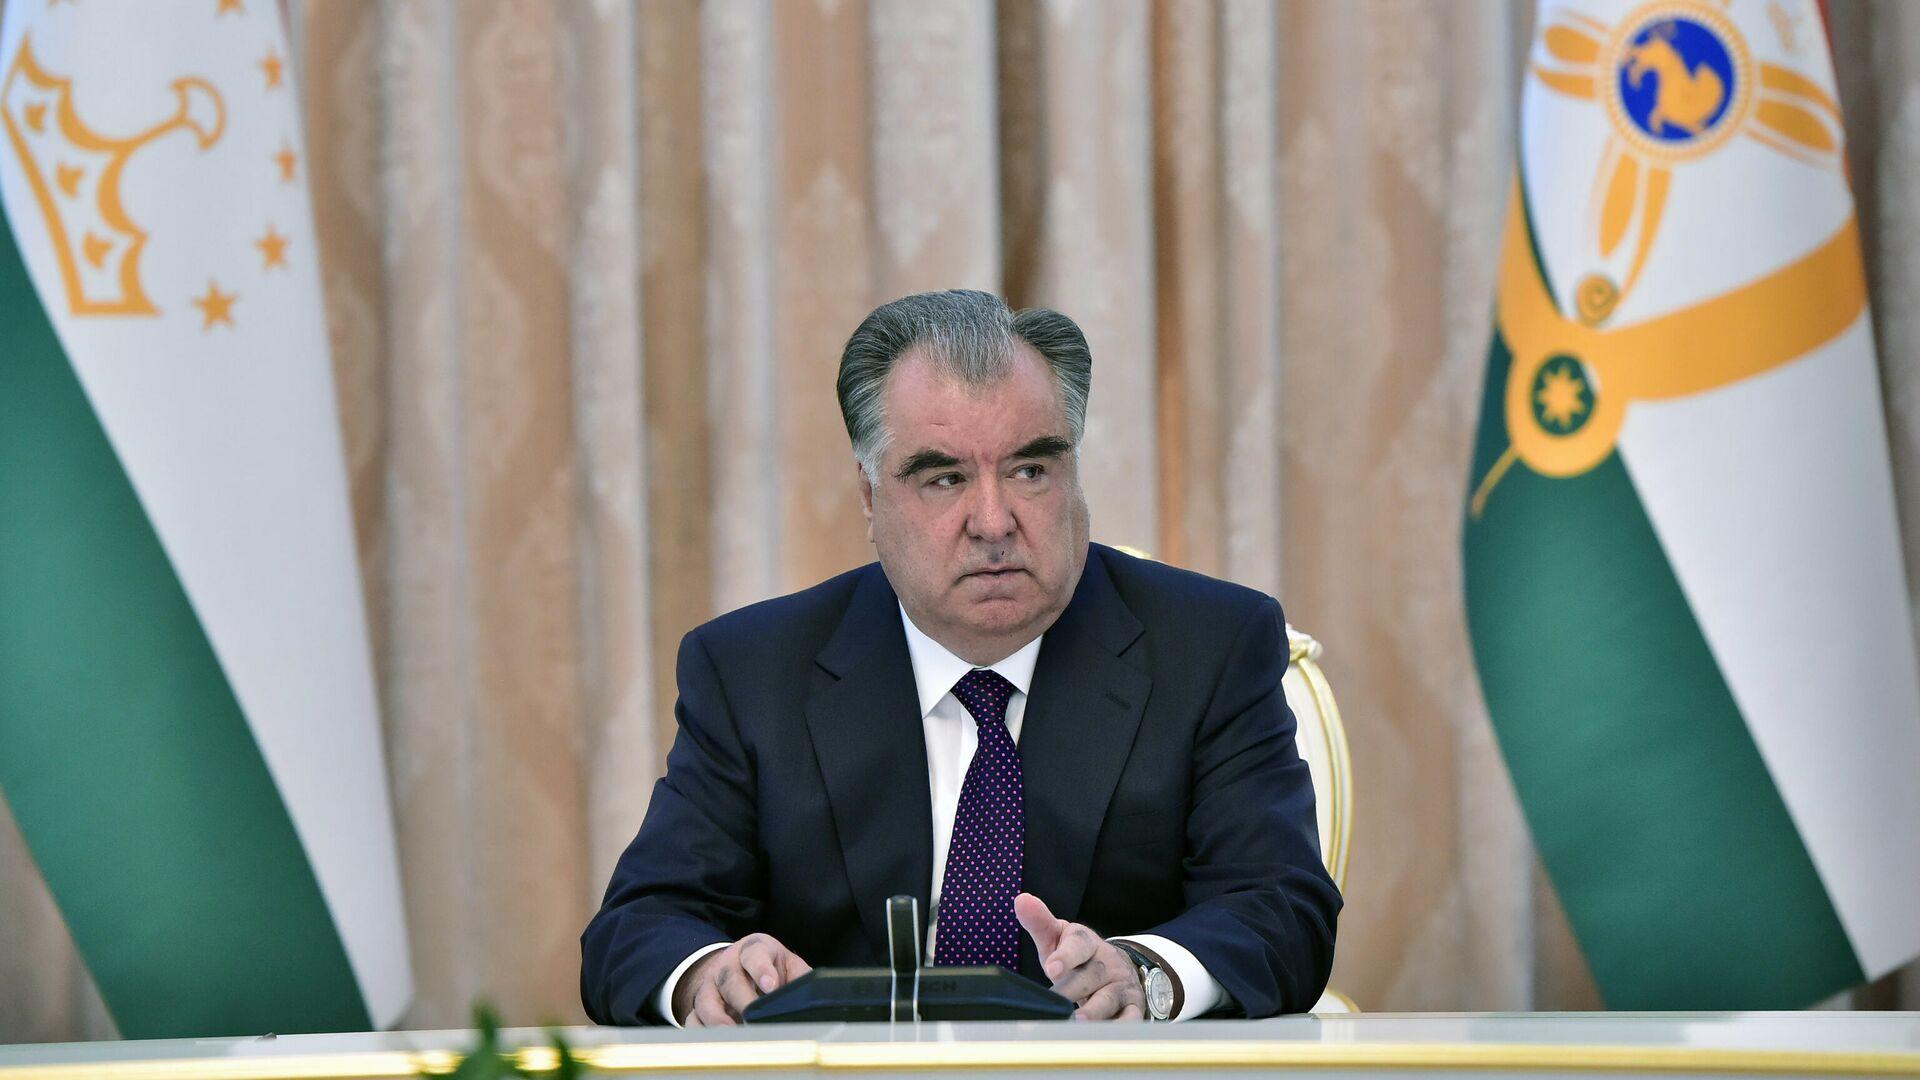 Президент Республики Таджикистан Эмомали Рахмон - Sputnik Таджикистан, 1920, 27.07.2021